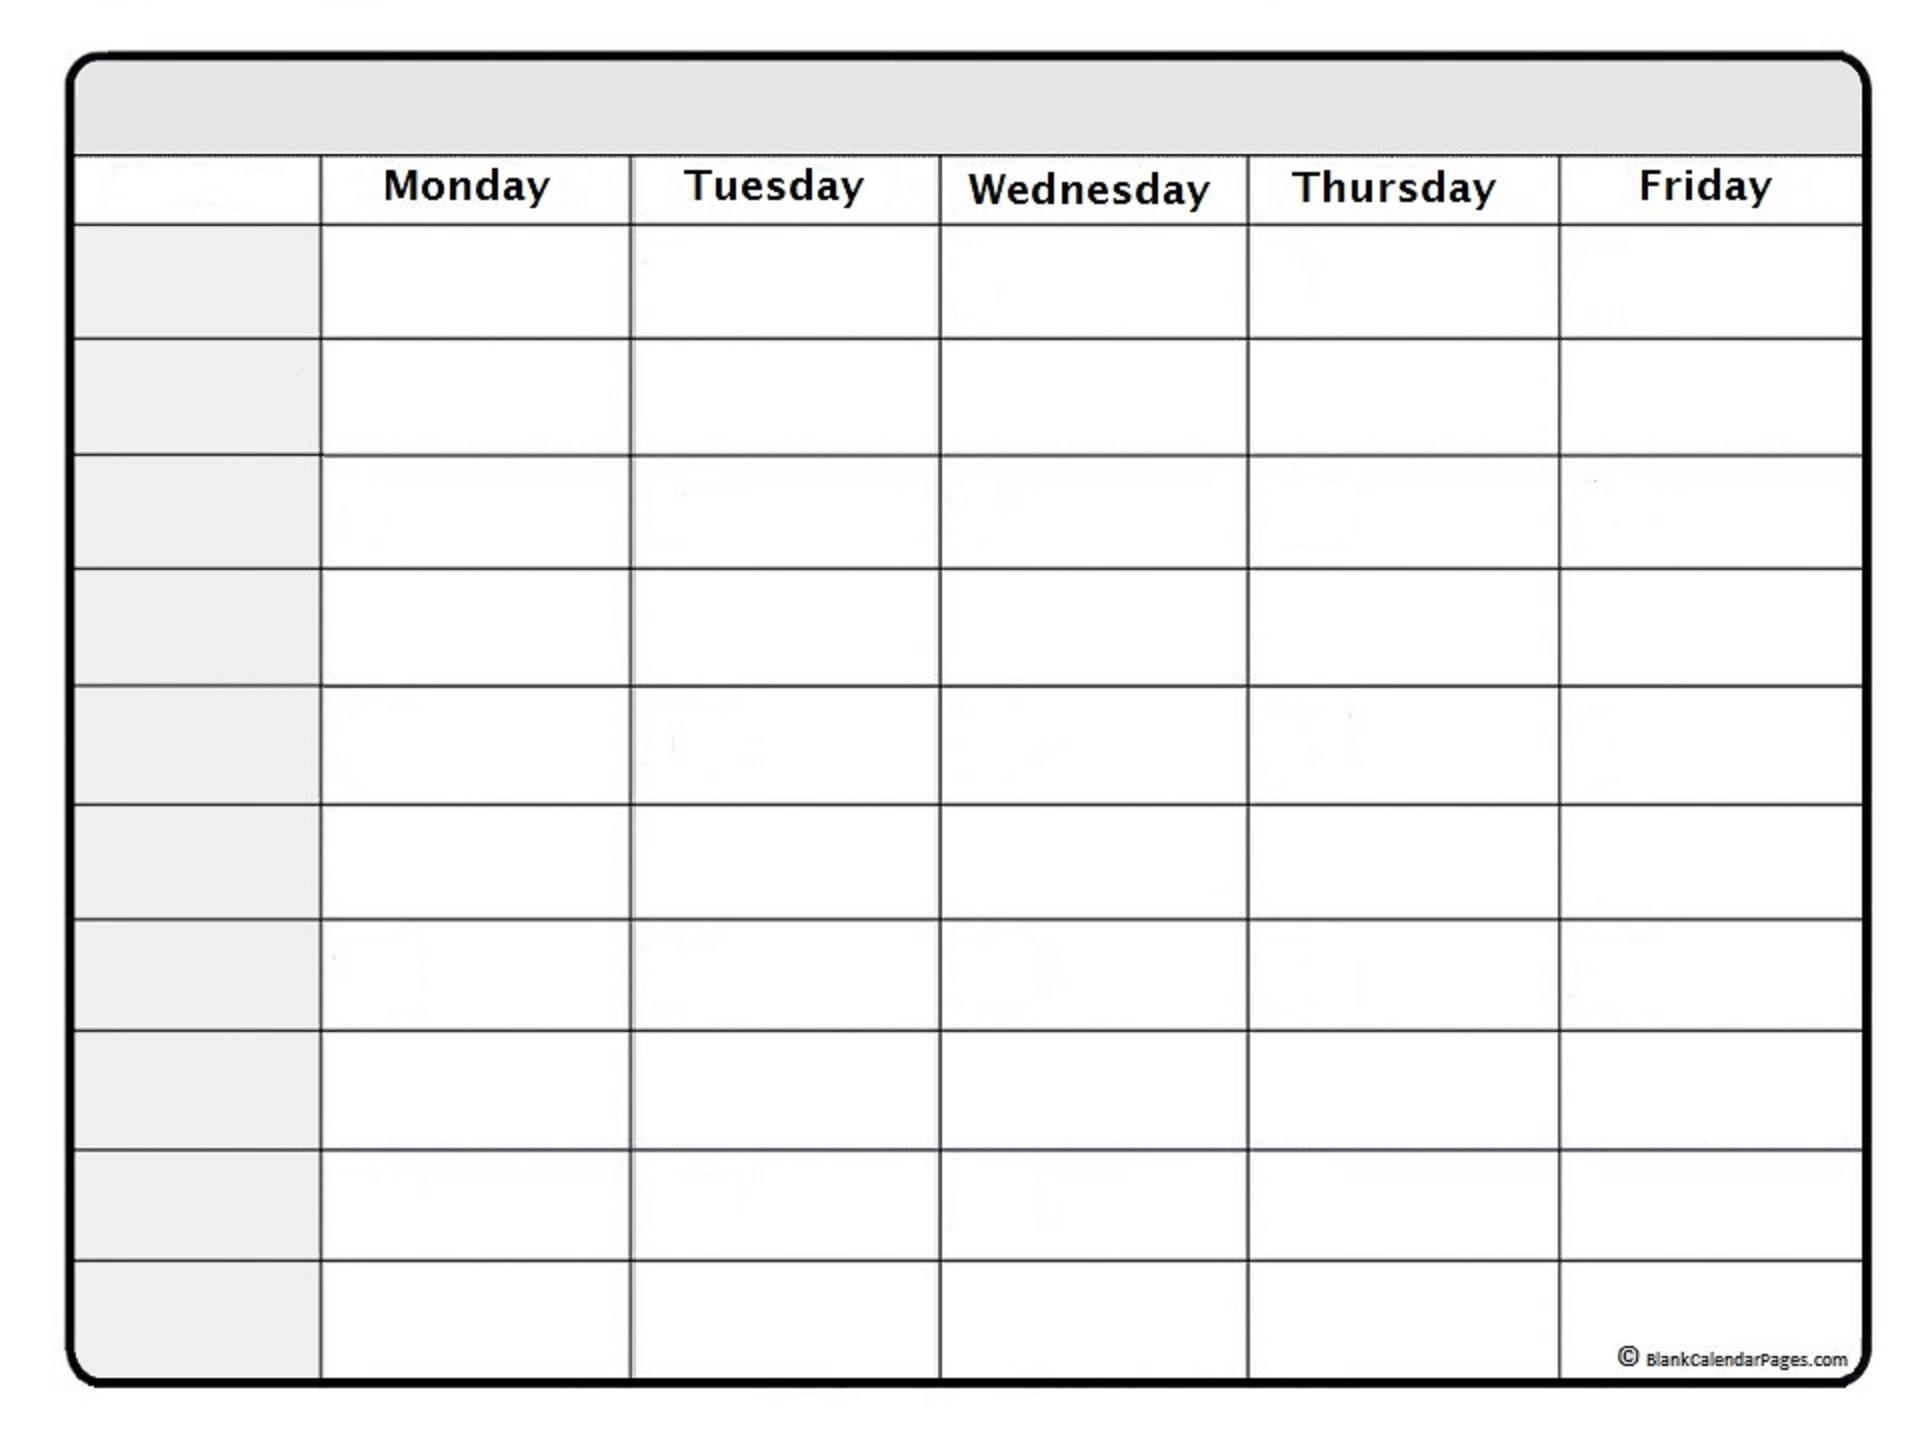 May 2020 Weekly Calendar   May 2020 Weekly Calendar Template